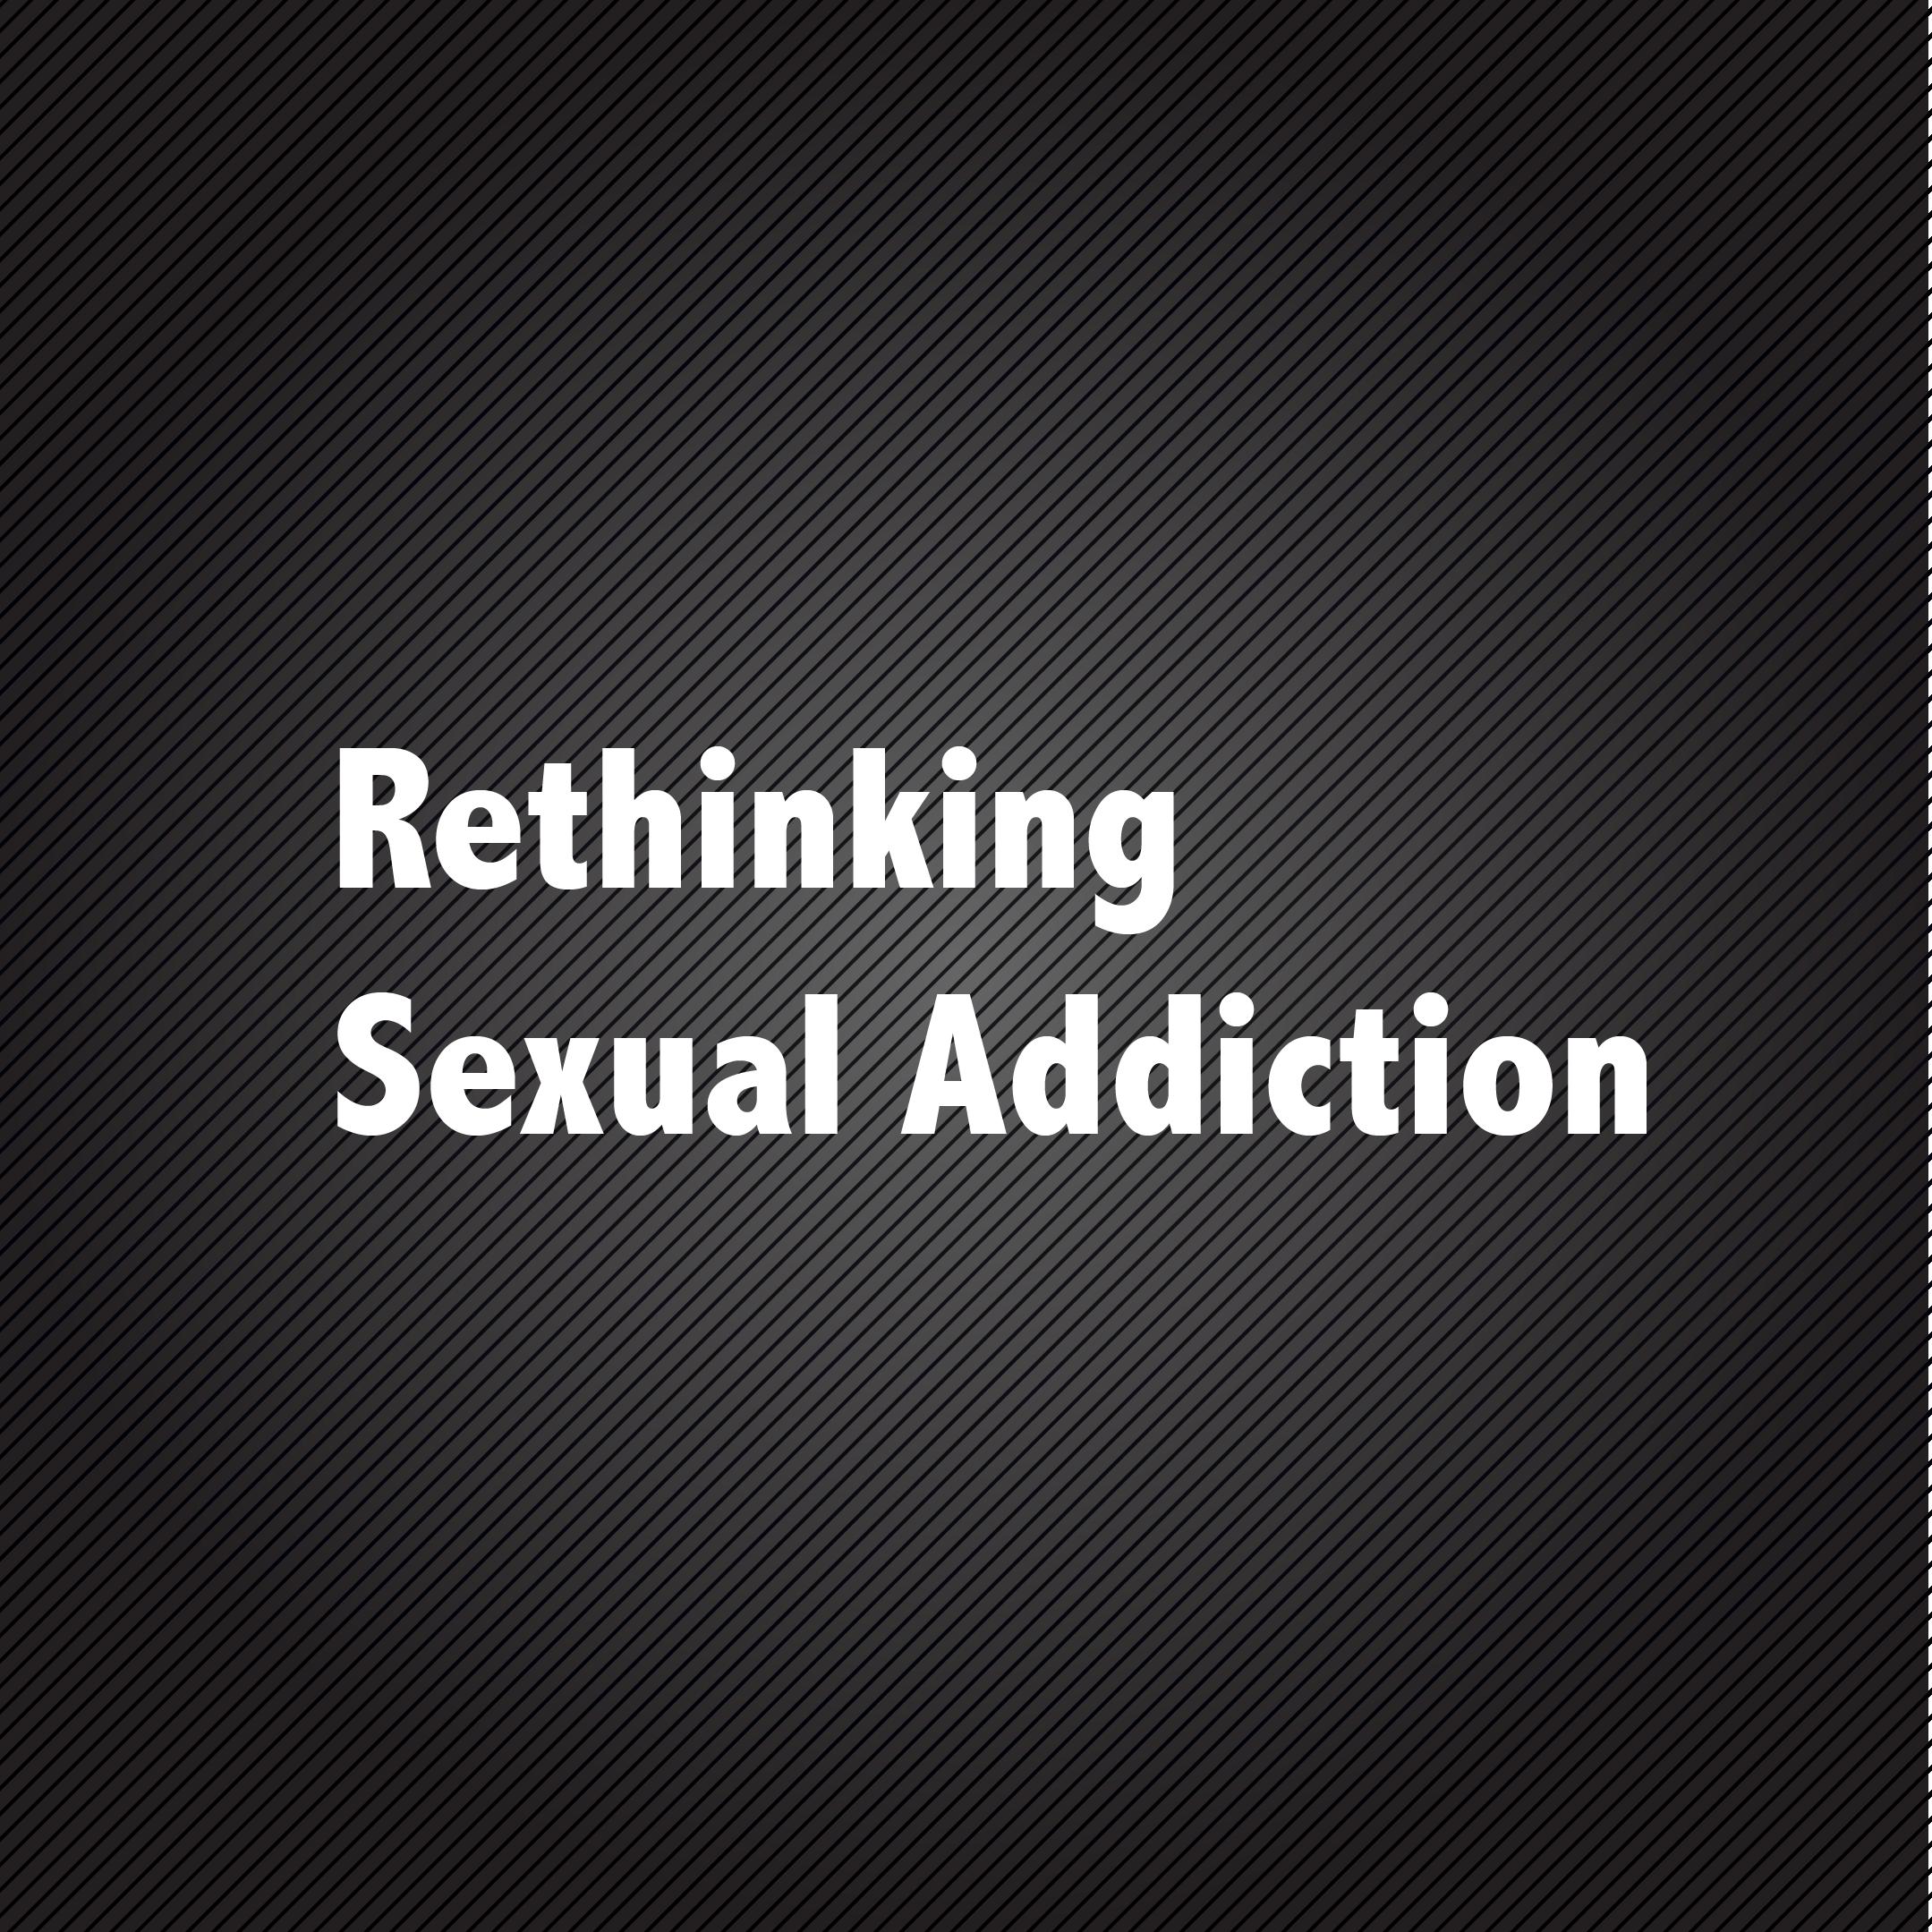 Sexualaddiction